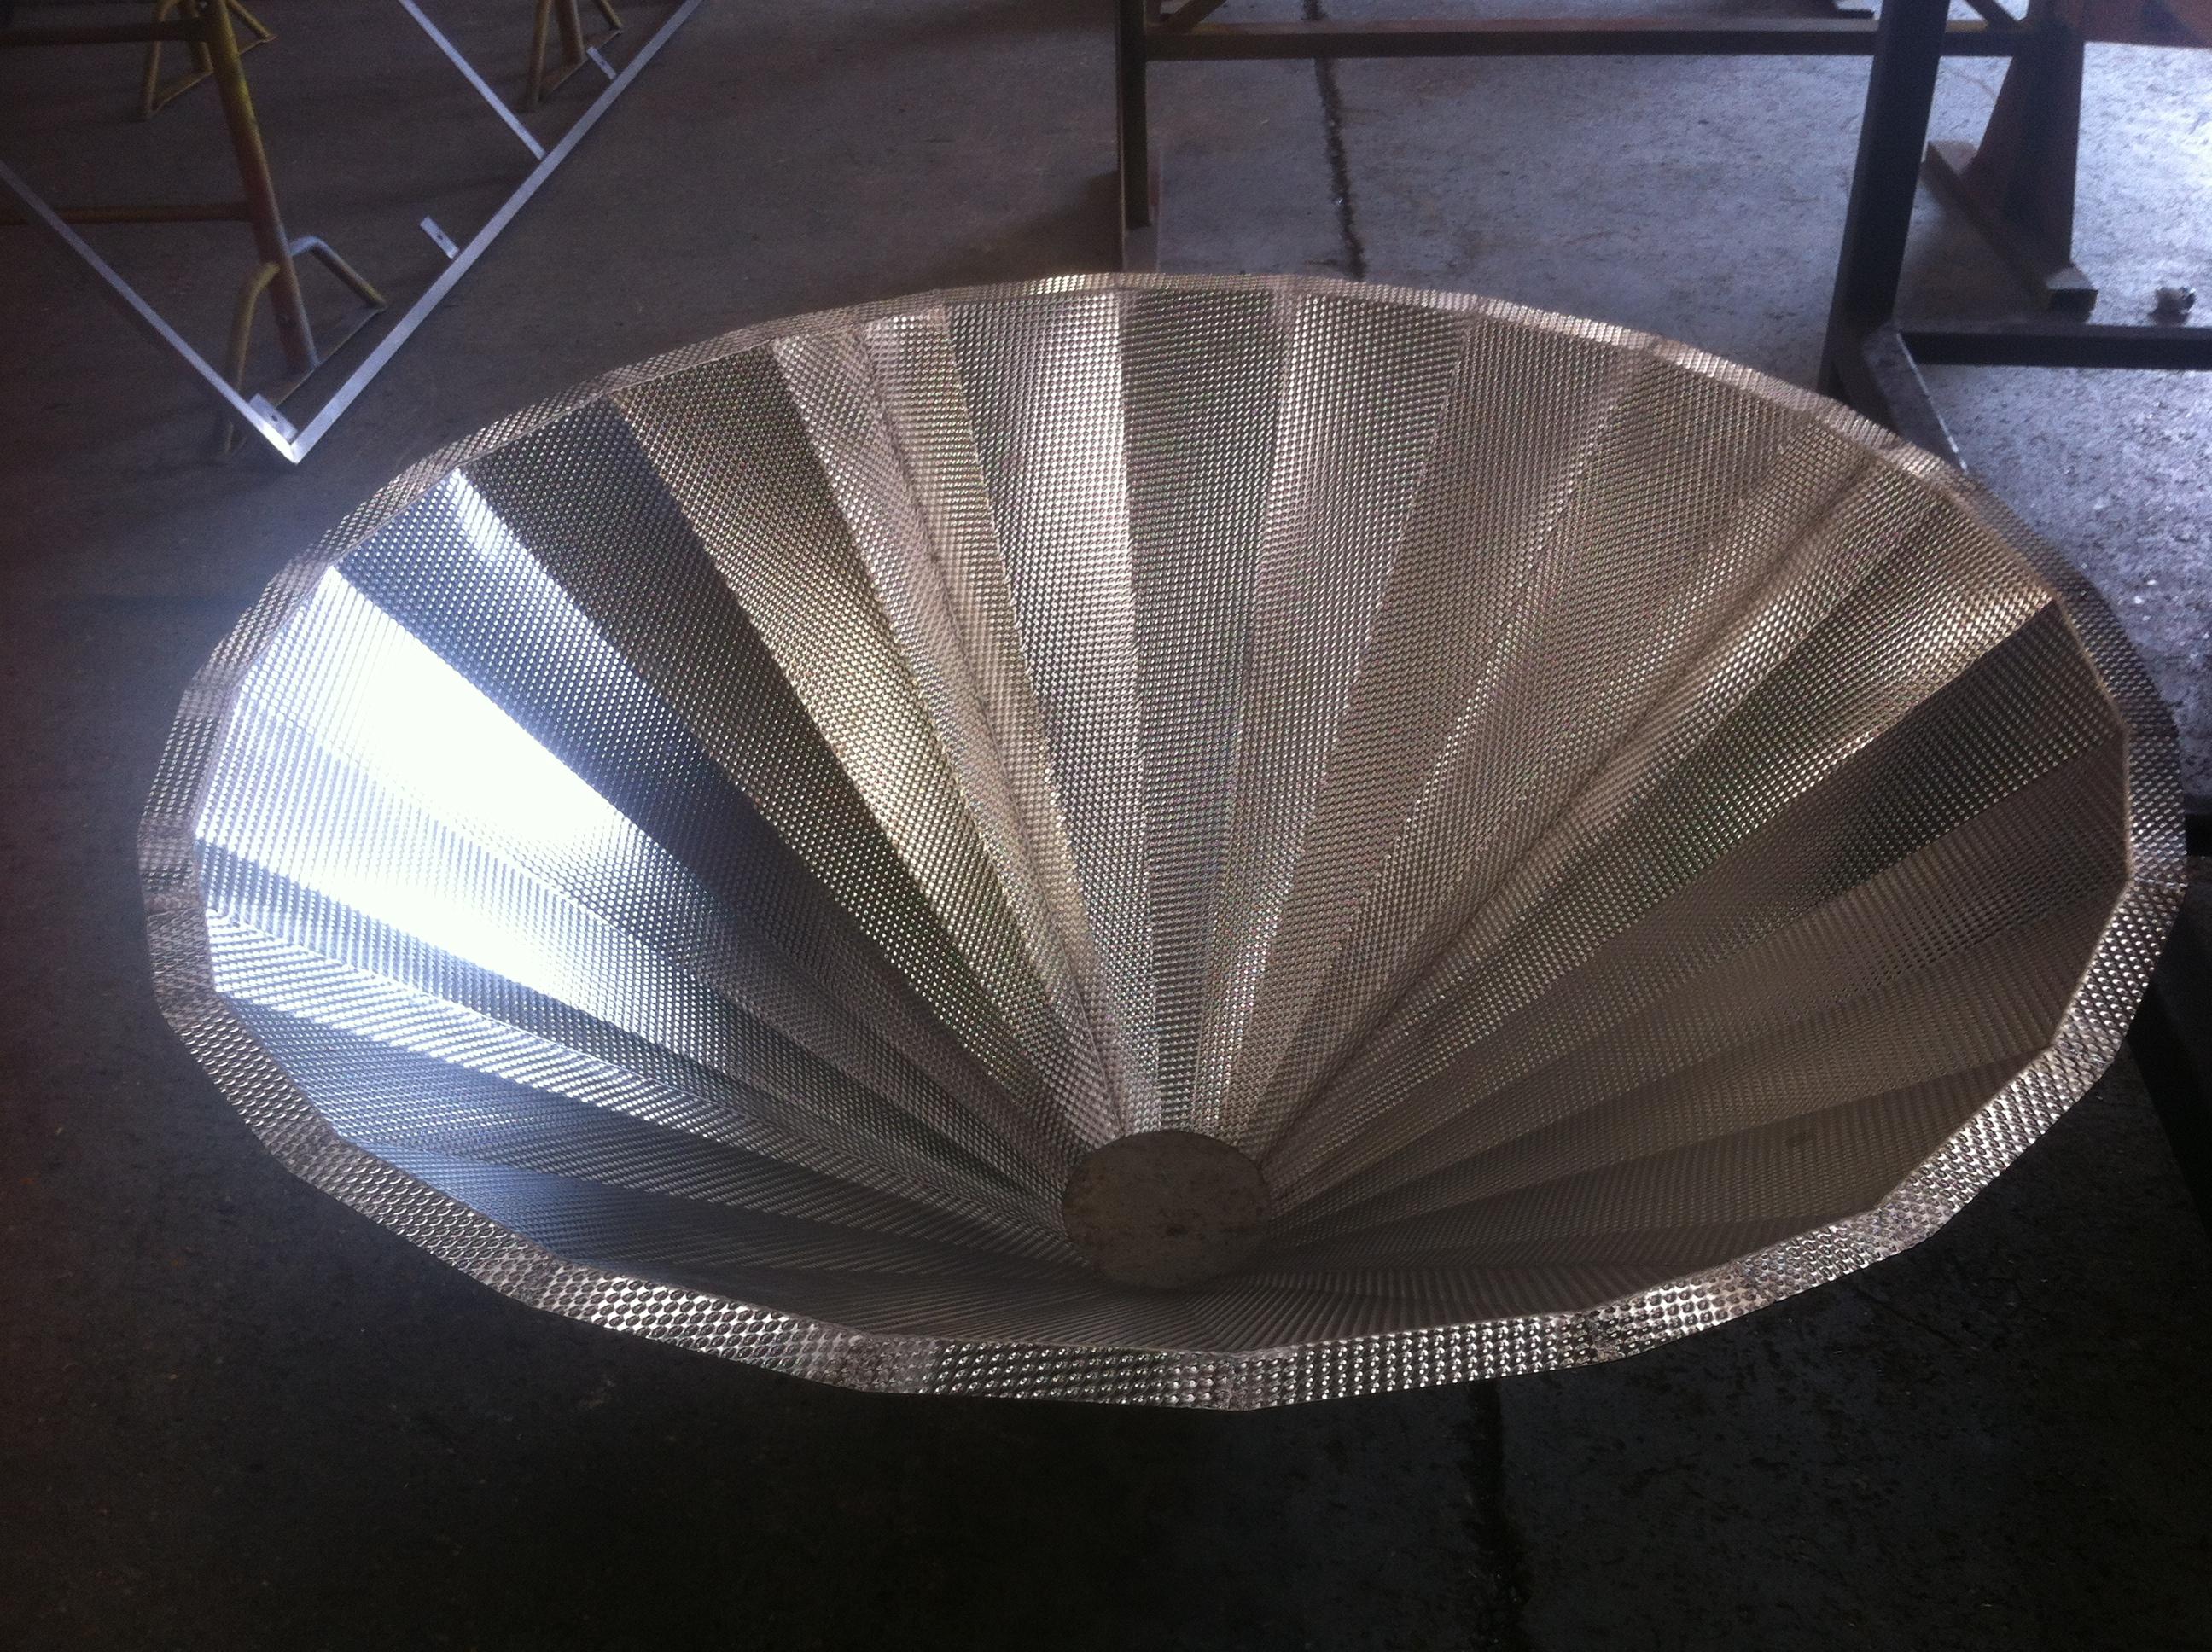 Stainless steel fabricator